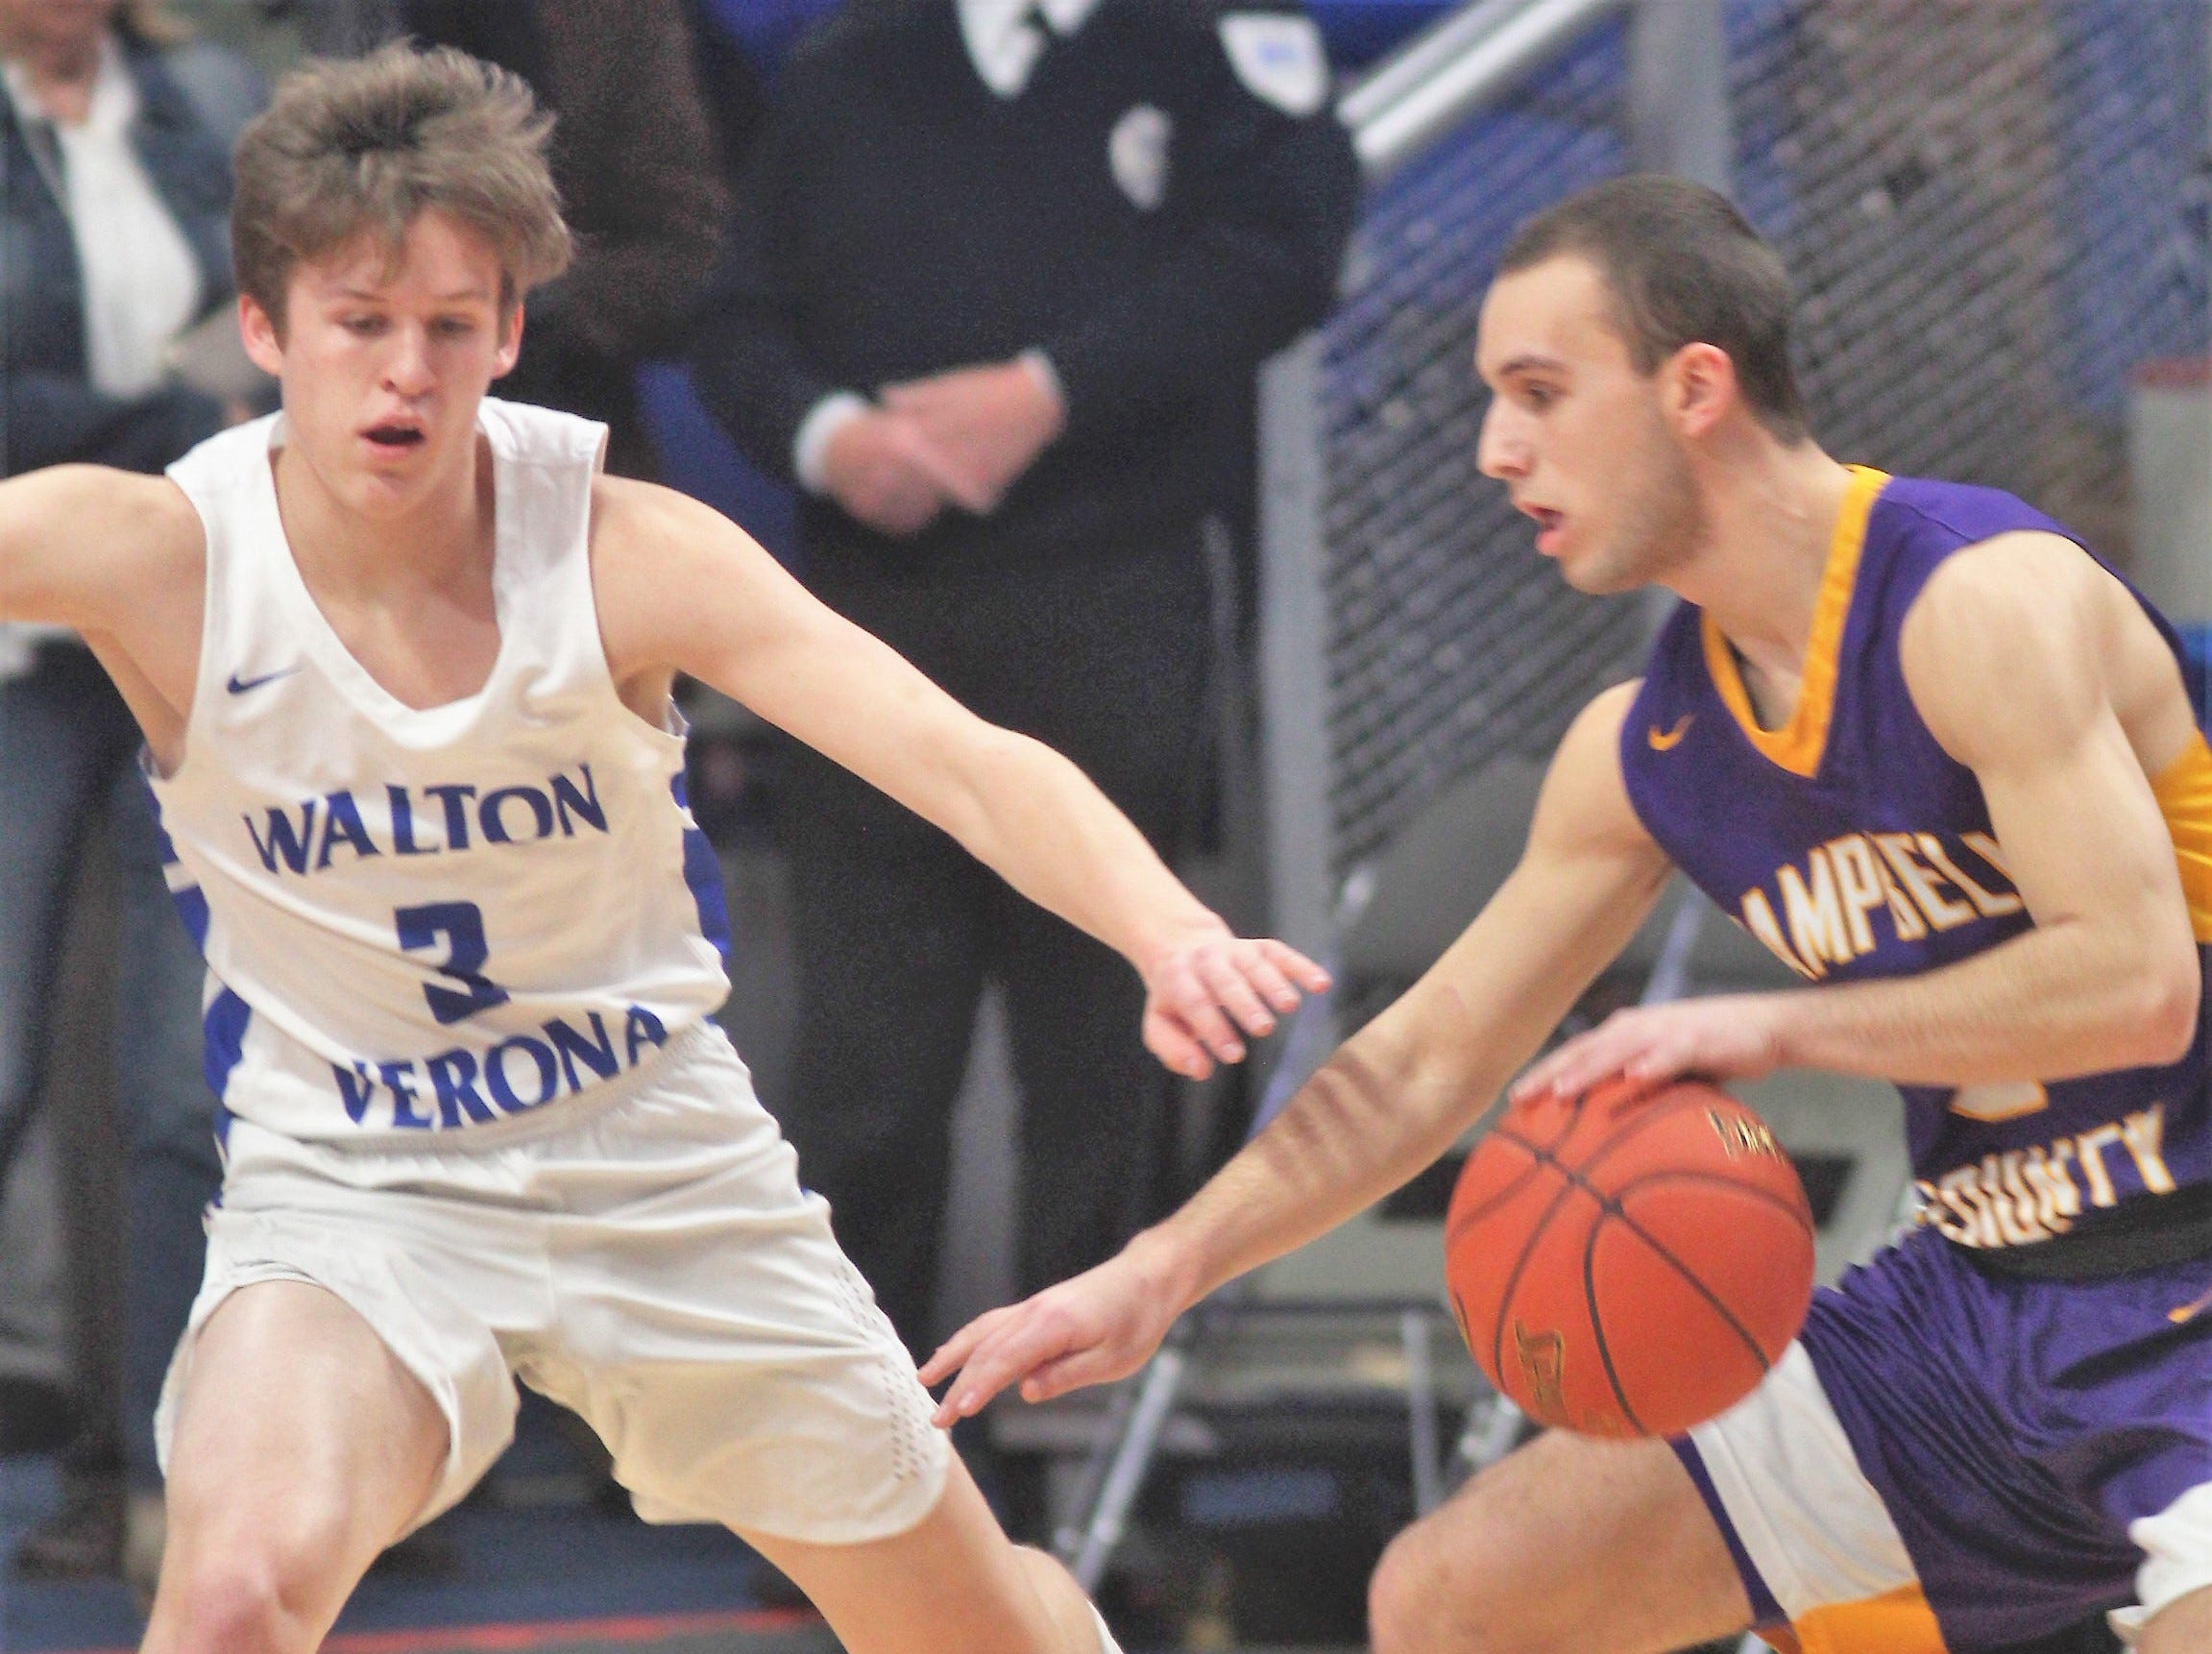 Walton-Verona senior Garrett Jones keeps an eye on Campbell County senior Noah Wirth as Campbell County defeated Walton-Verona 49-42 in the state quarterfinals of the Whitaker Bank/KHSAA Boys Basketball Sweet 16 March 8, 2019, at Rupp Arena.